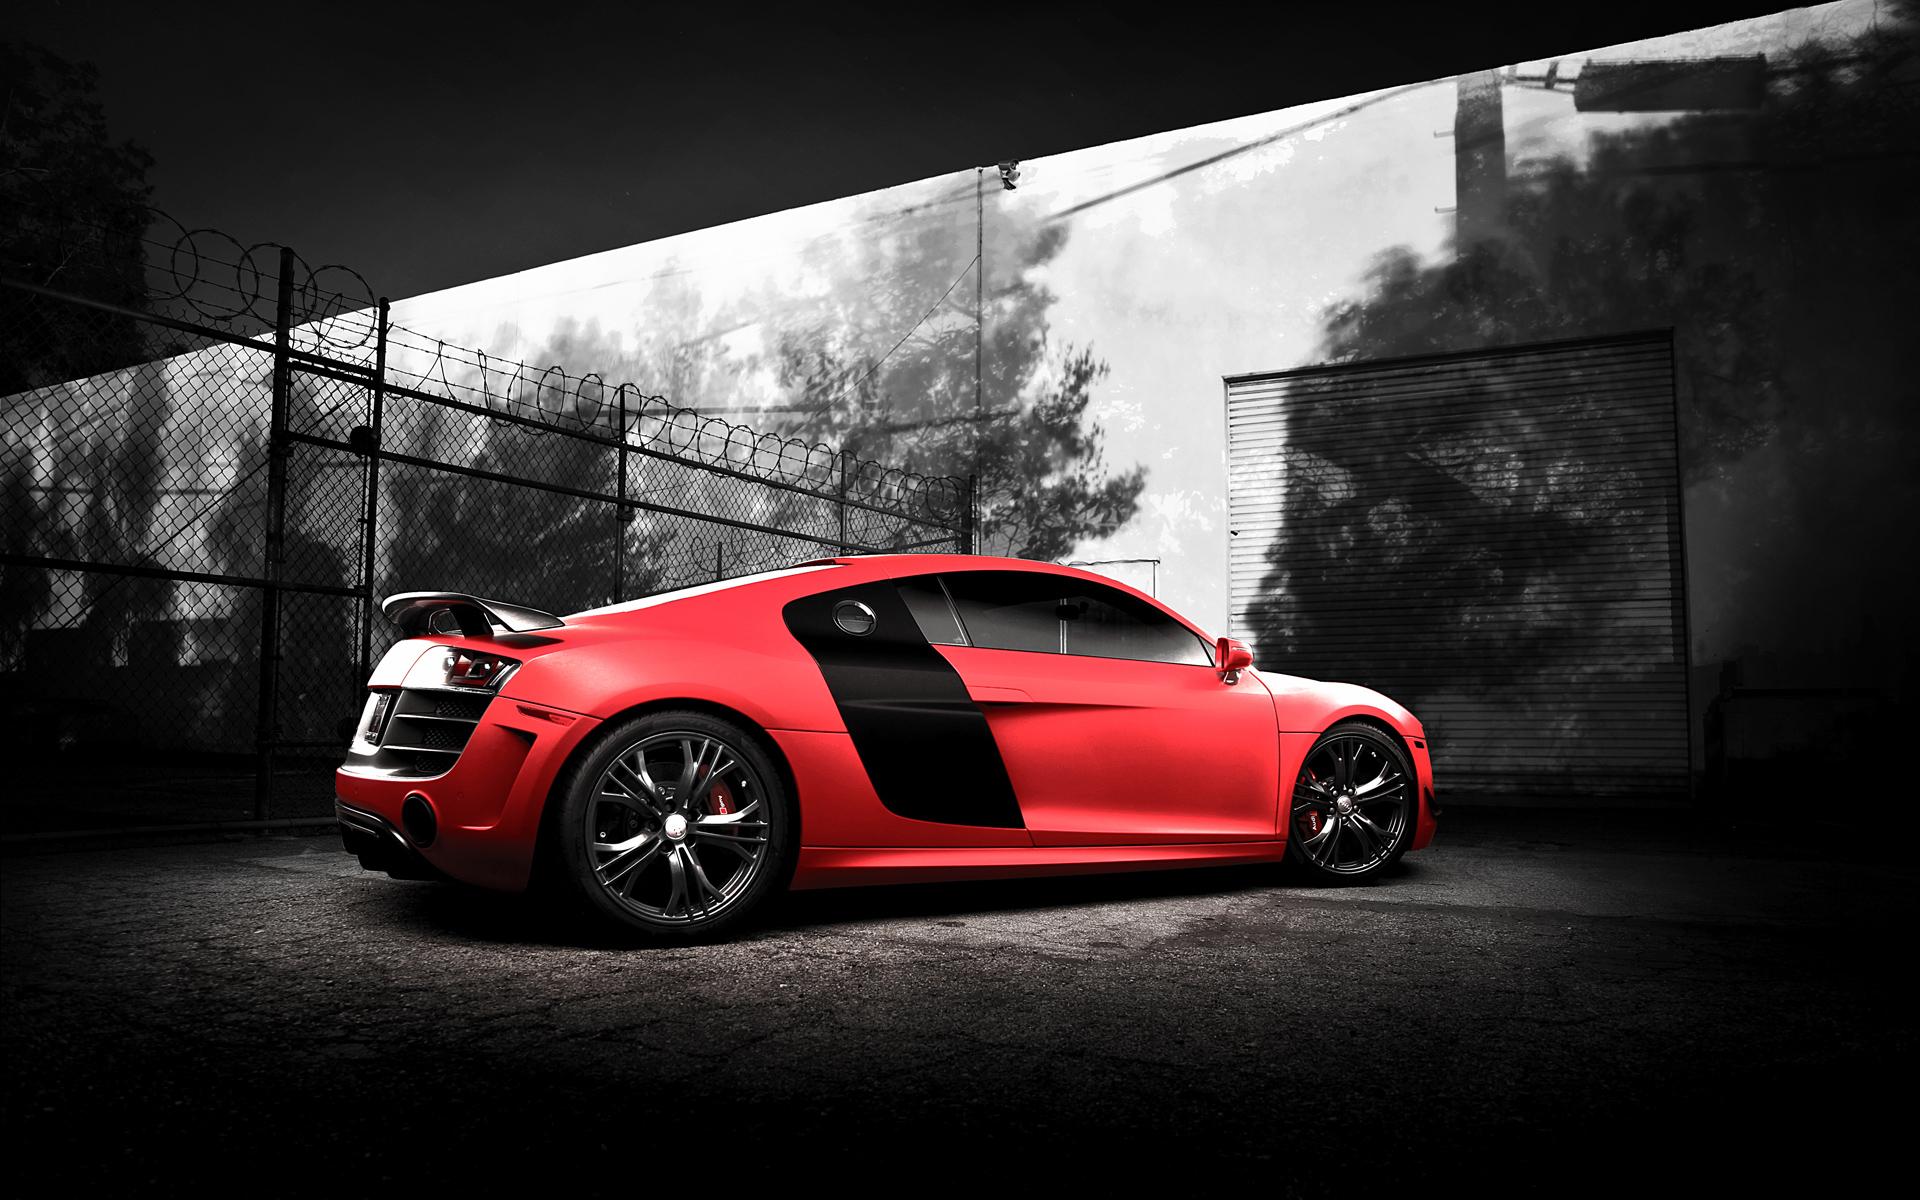 Audi R8 Wallpaper 49368 1920x1200 px ~ HDWallSource.com